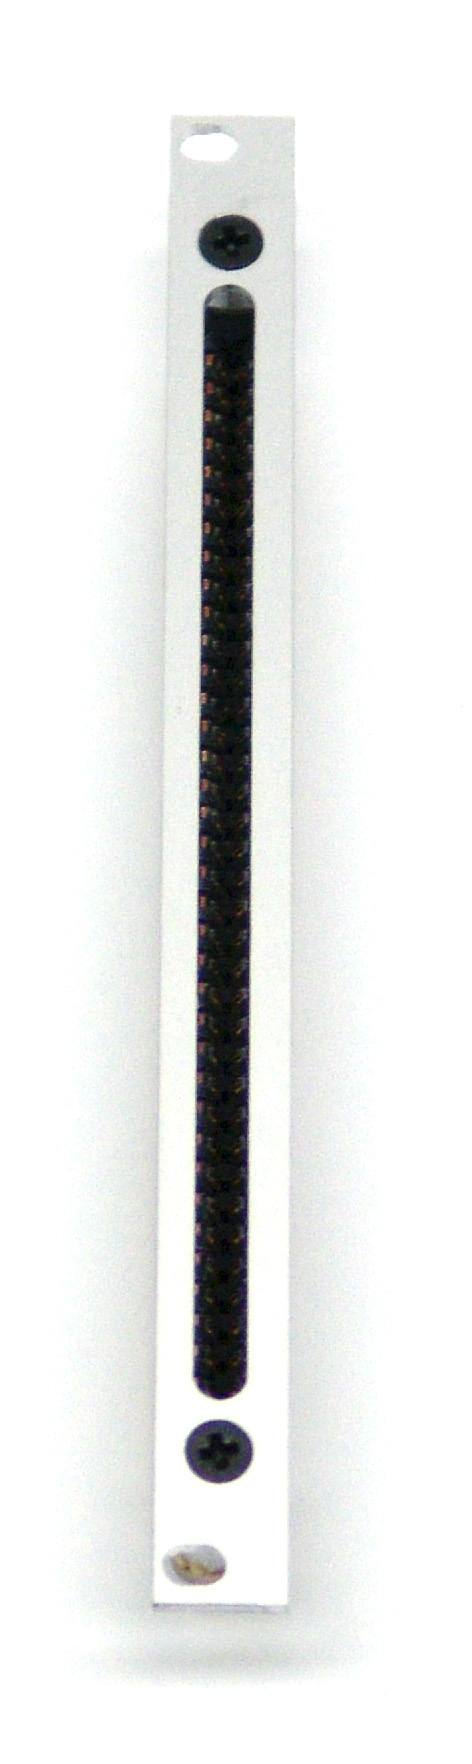 2HP ZCARD holder2